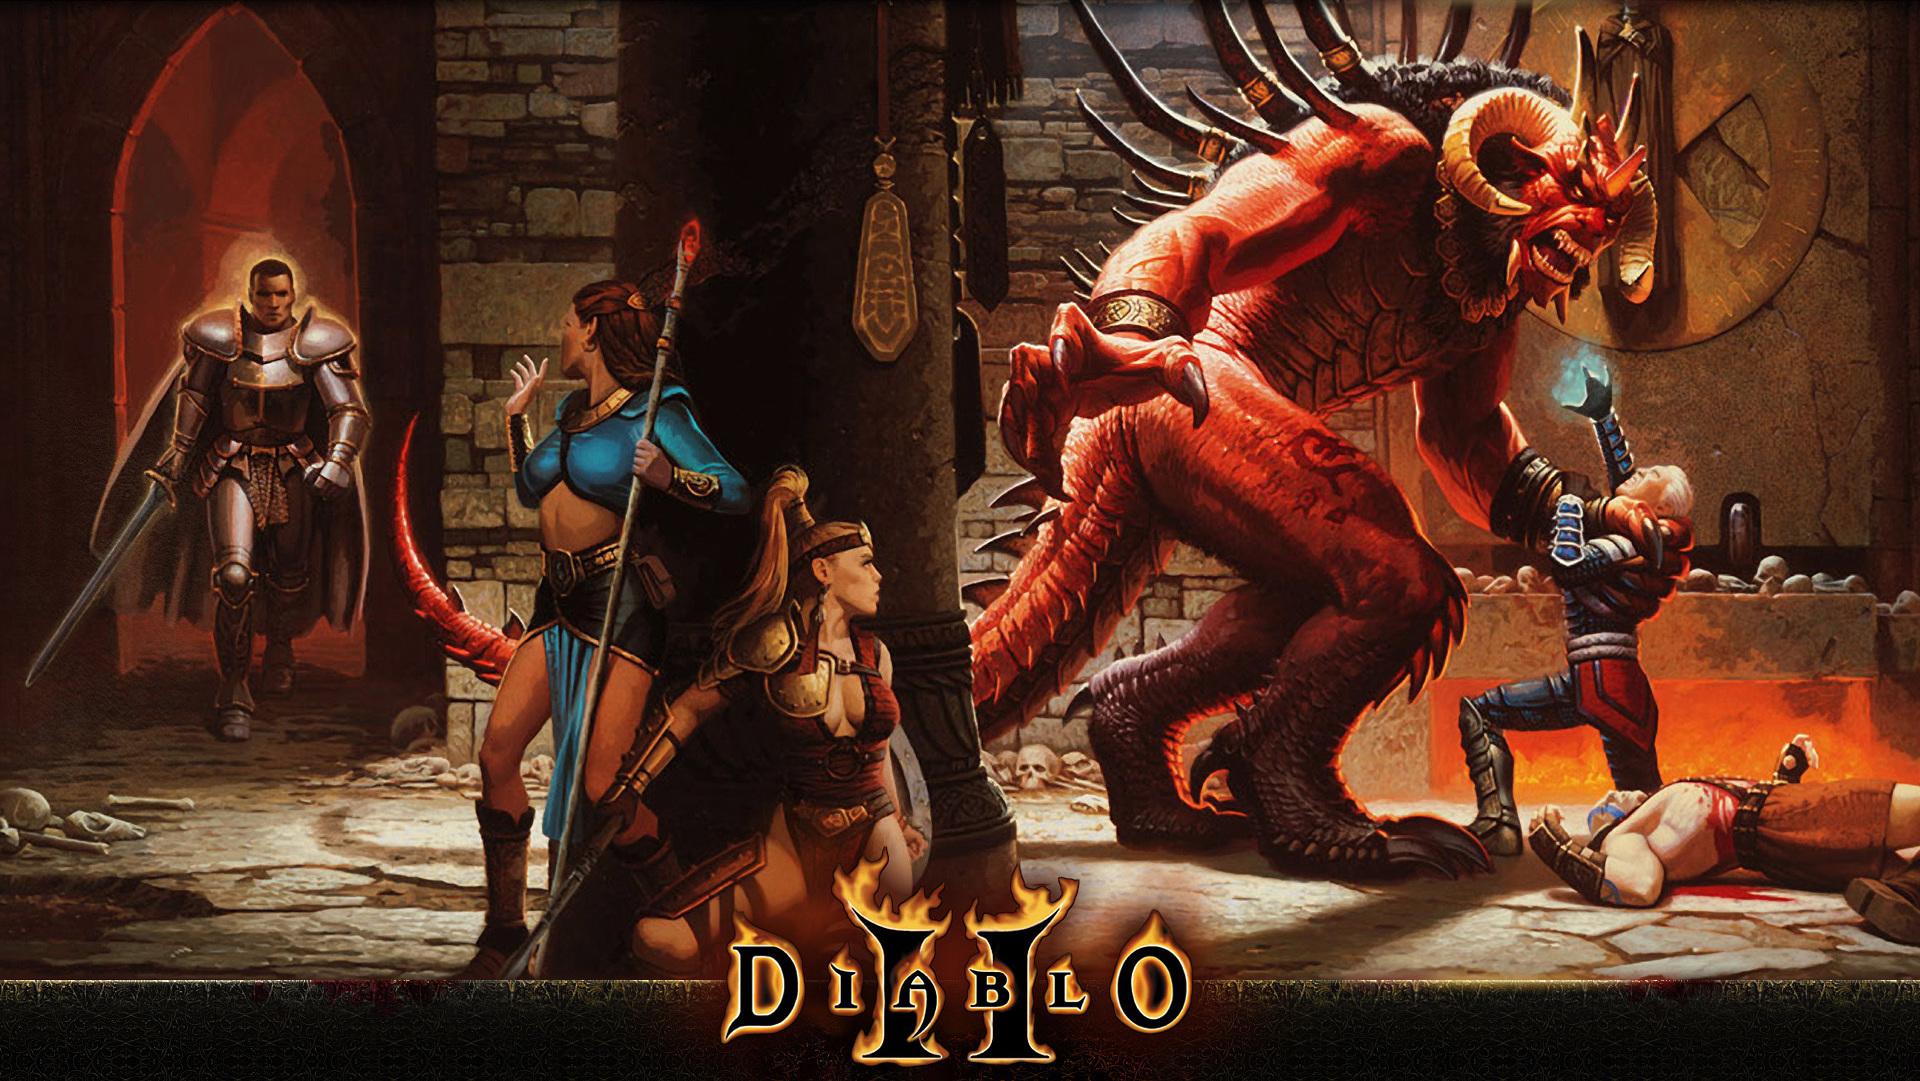 Diablo 2 Resurrected All The Diablo 2 Remaster News You Need To Know Techradar